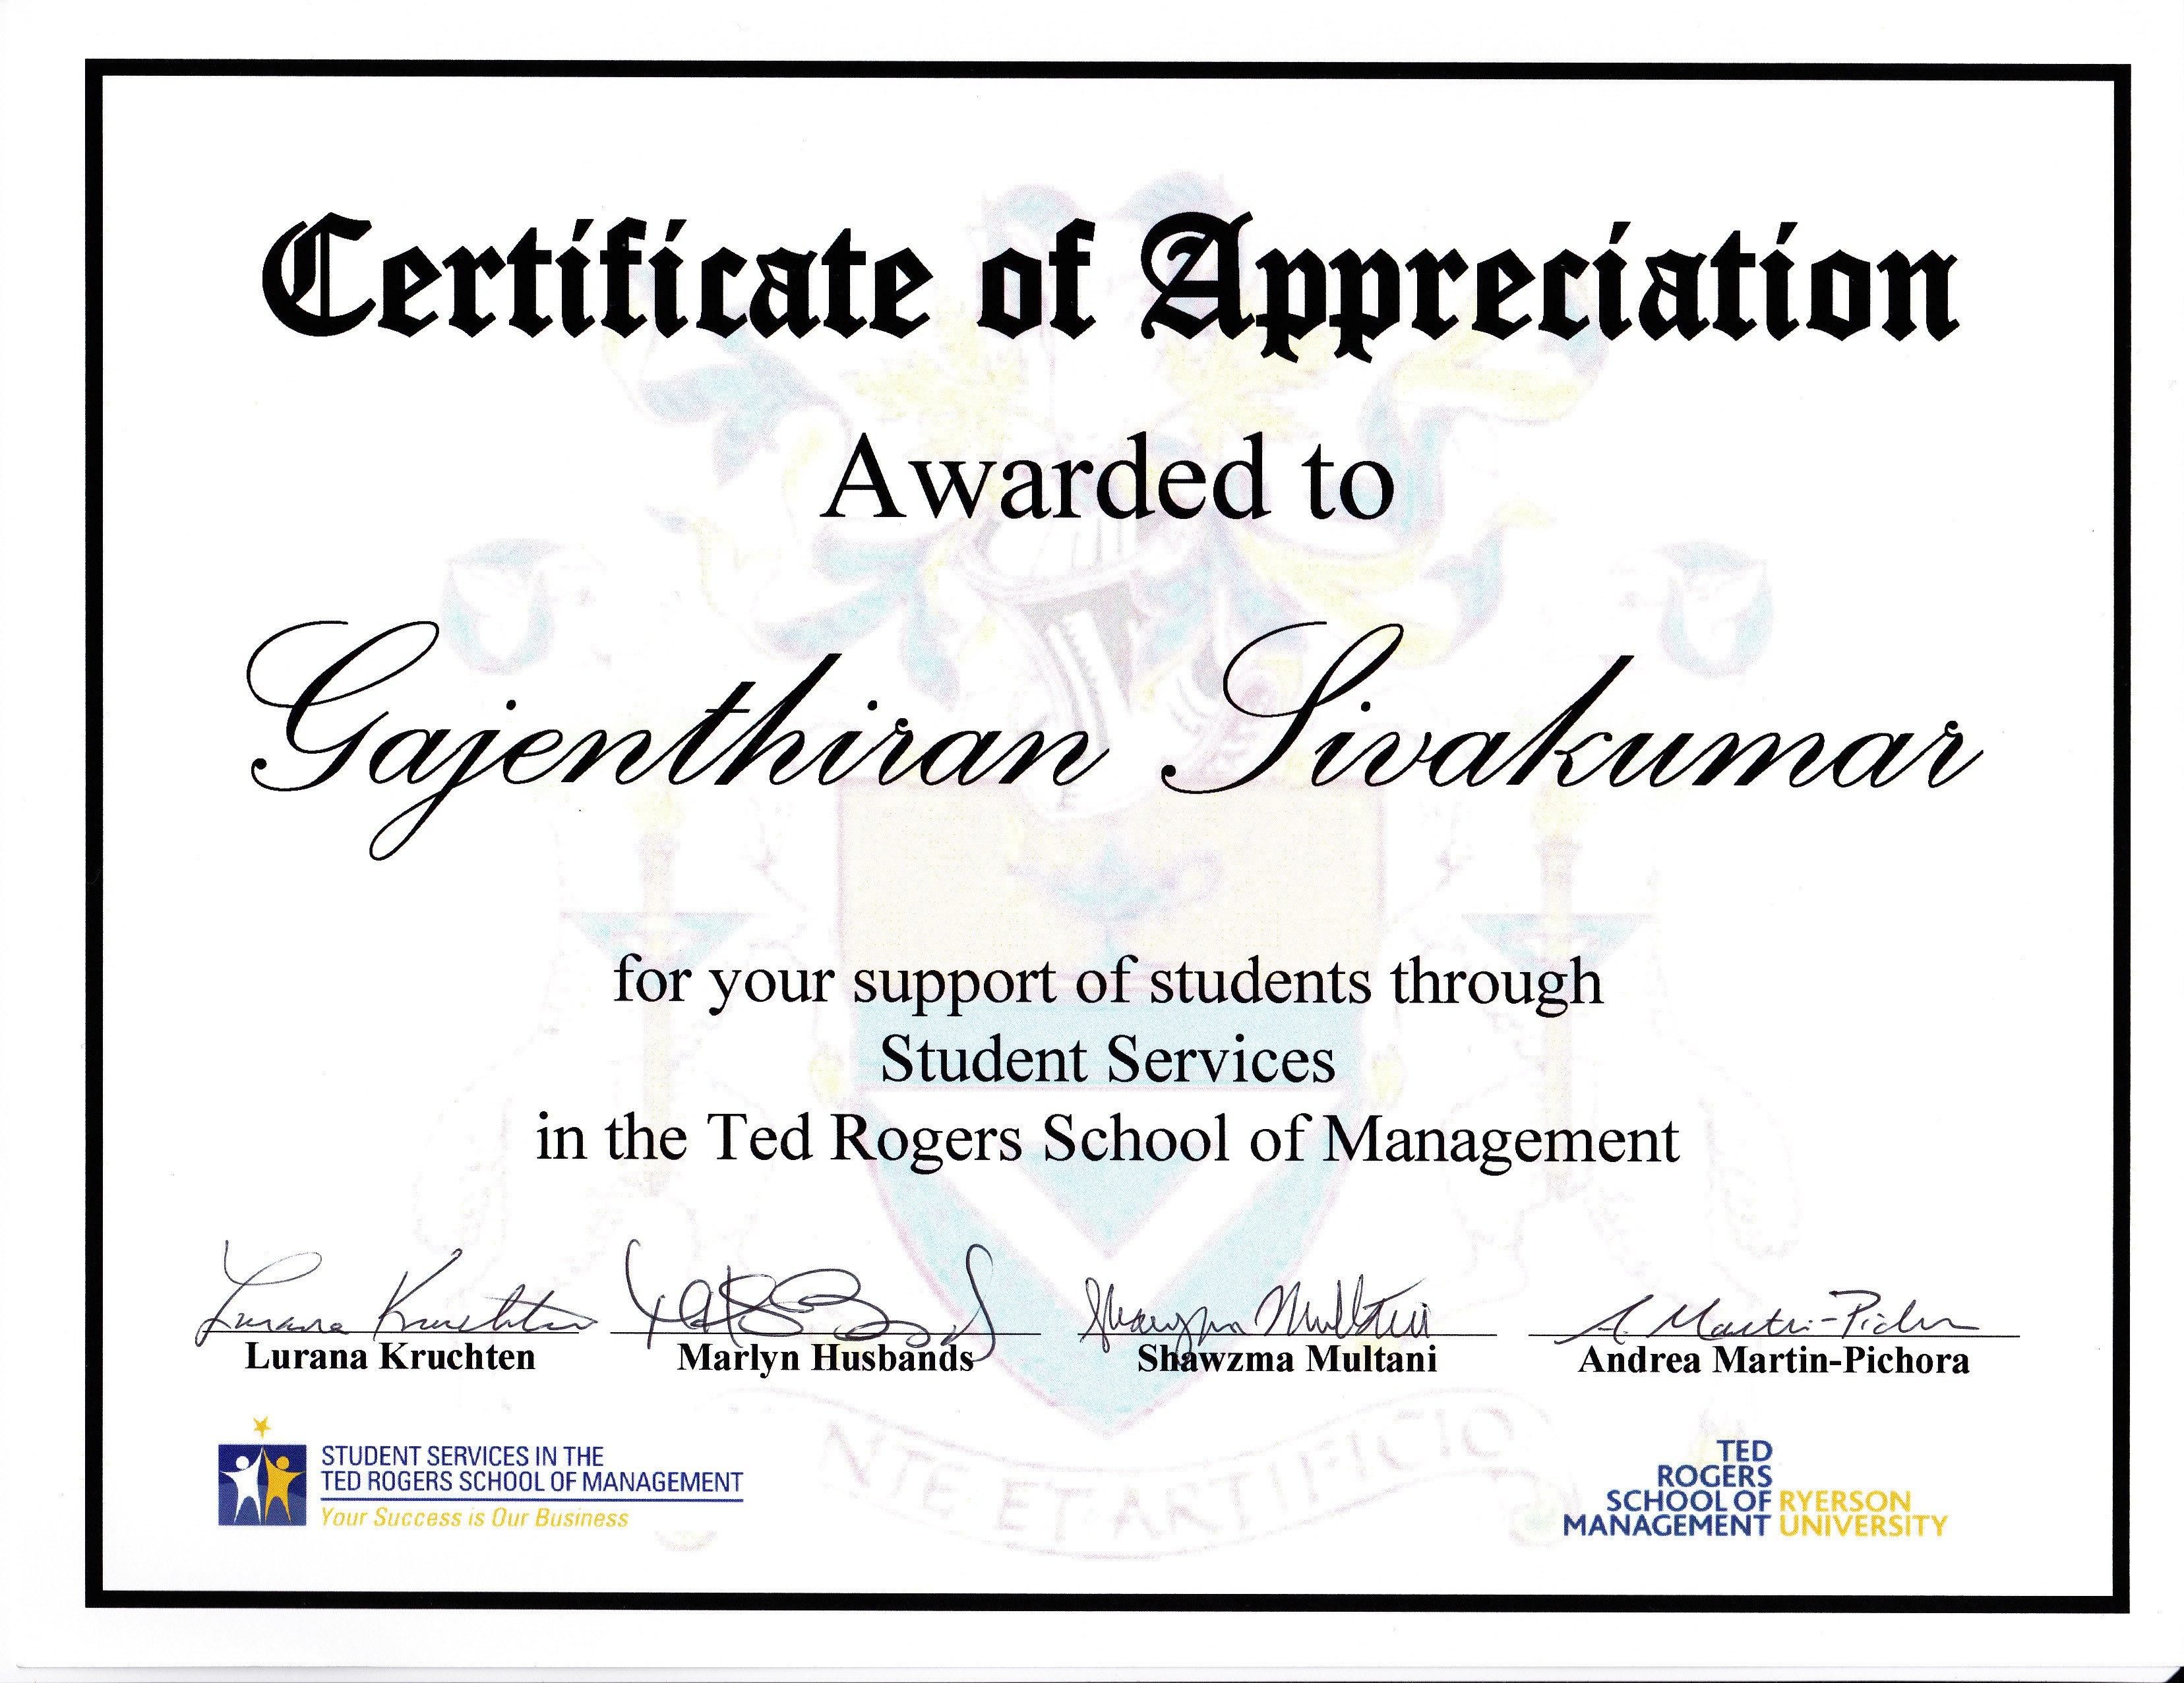 Volunteer Certificate Of Appreciation Awards and Certificates